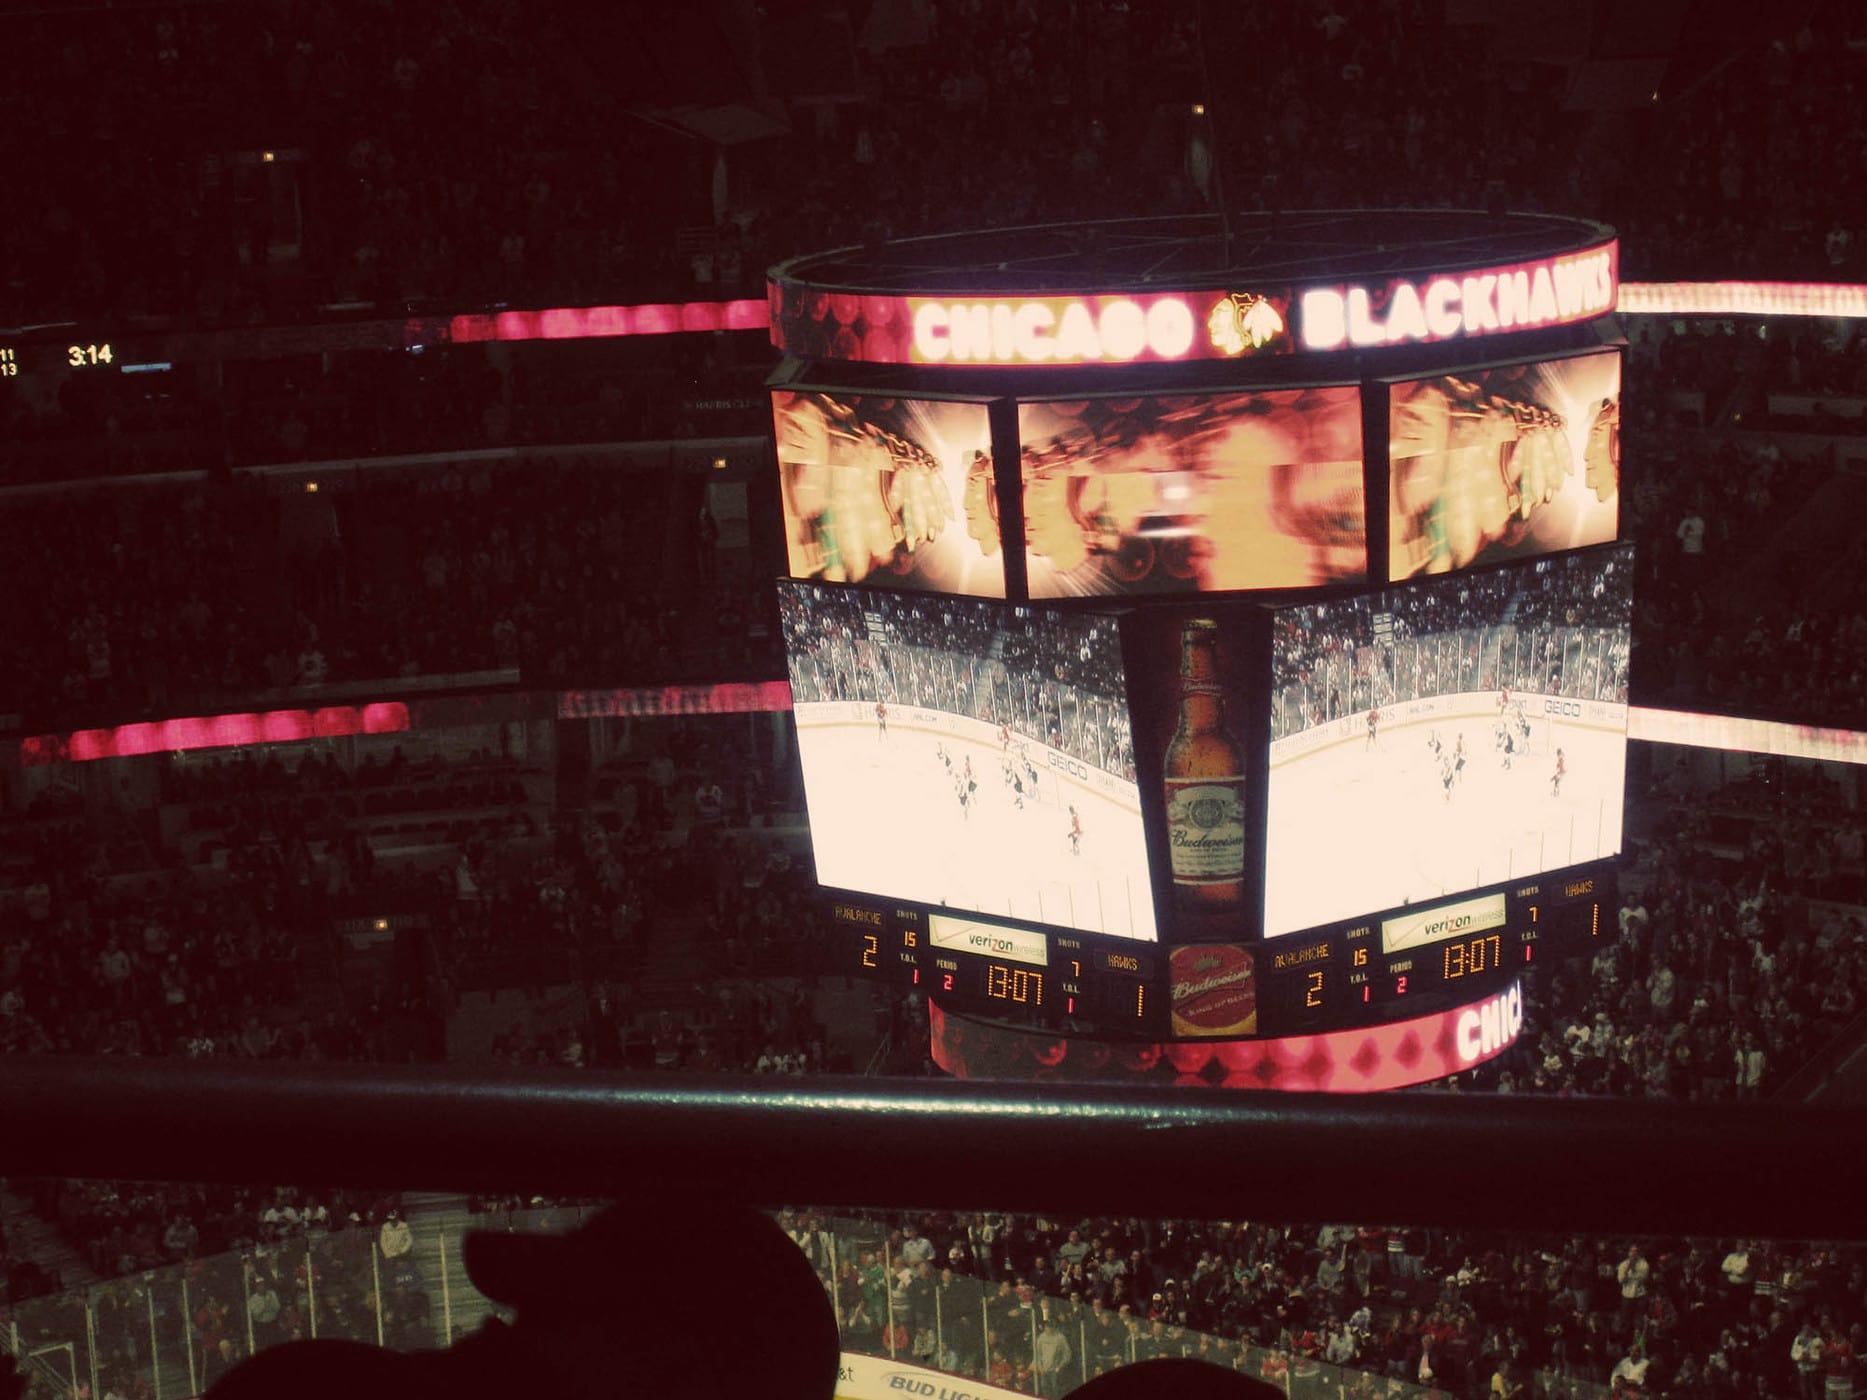 Blackhawks Game